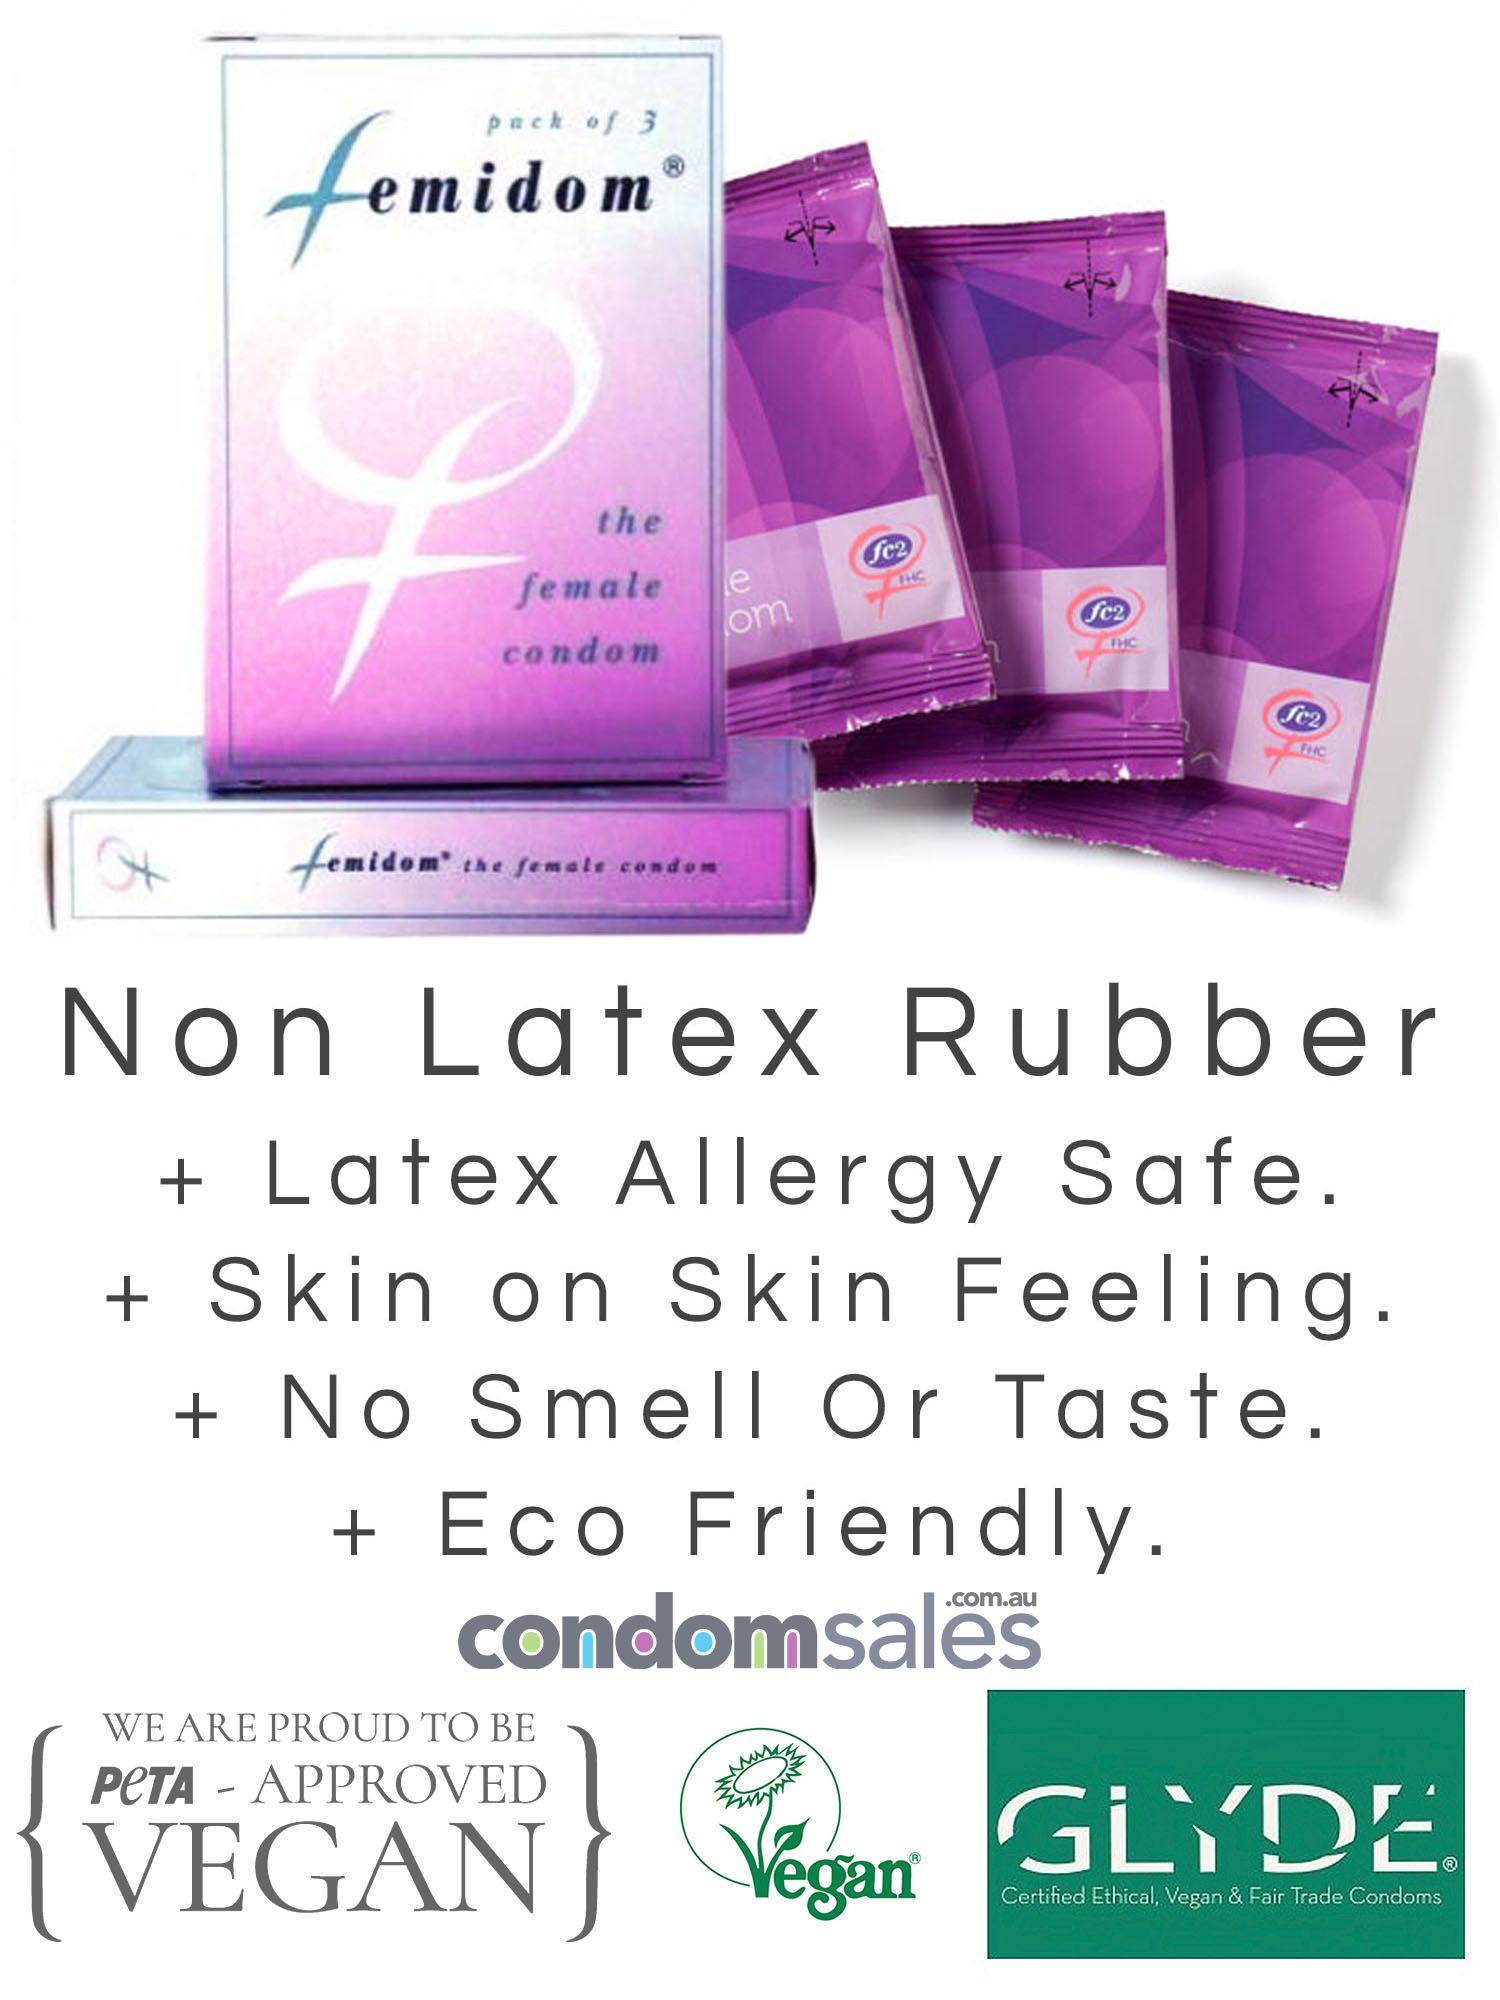 Femidom Female Condom 3 Pack - Buy Female Condoms Online